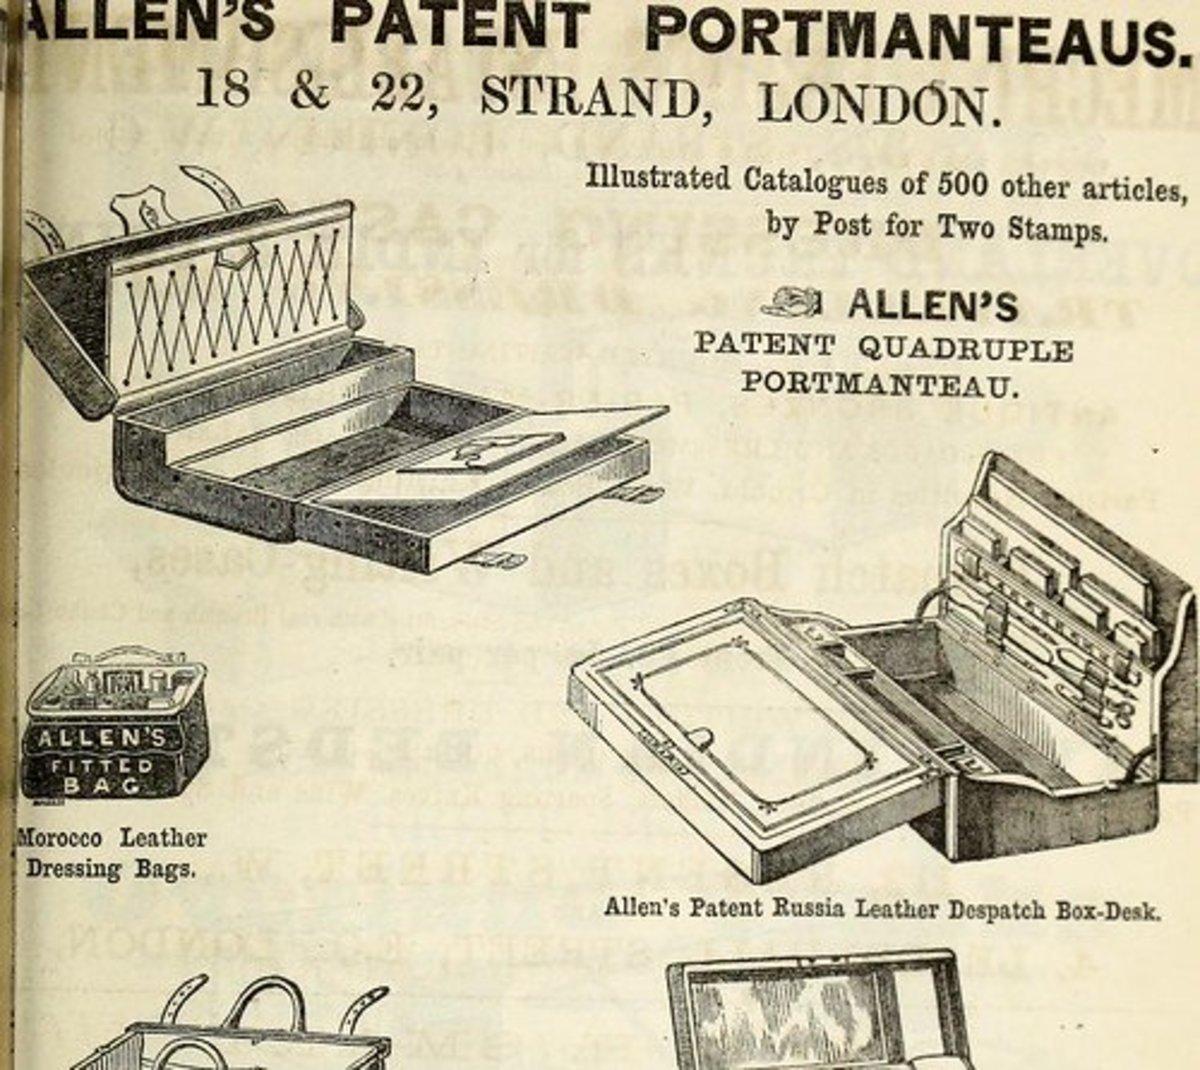 The Original Meaning of Portmanteau